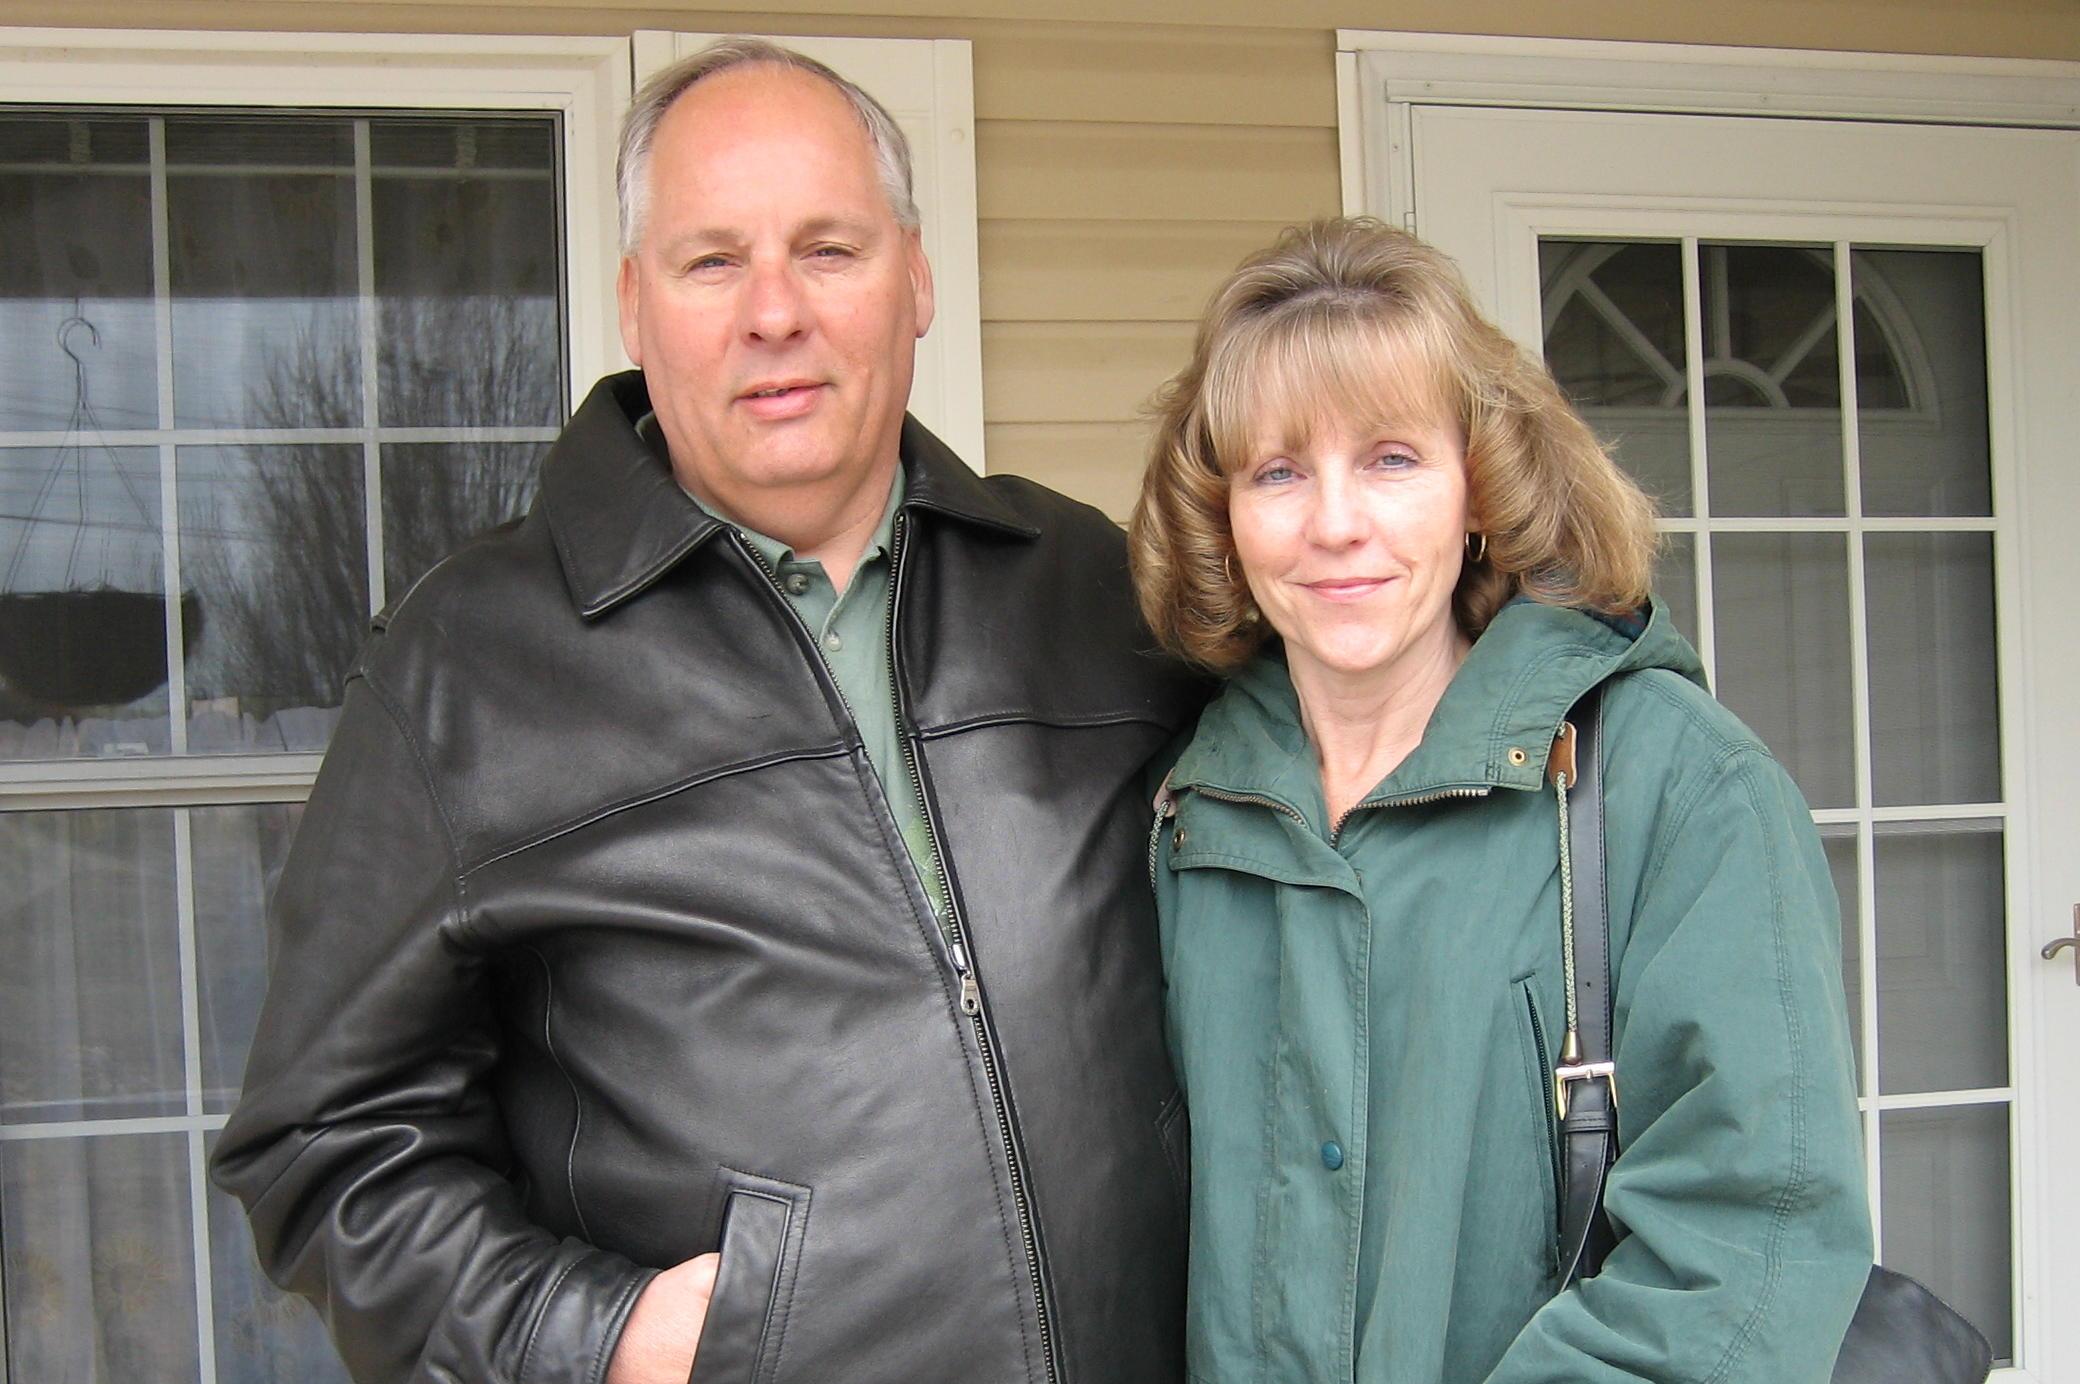 Karen Godin and her husband Gary